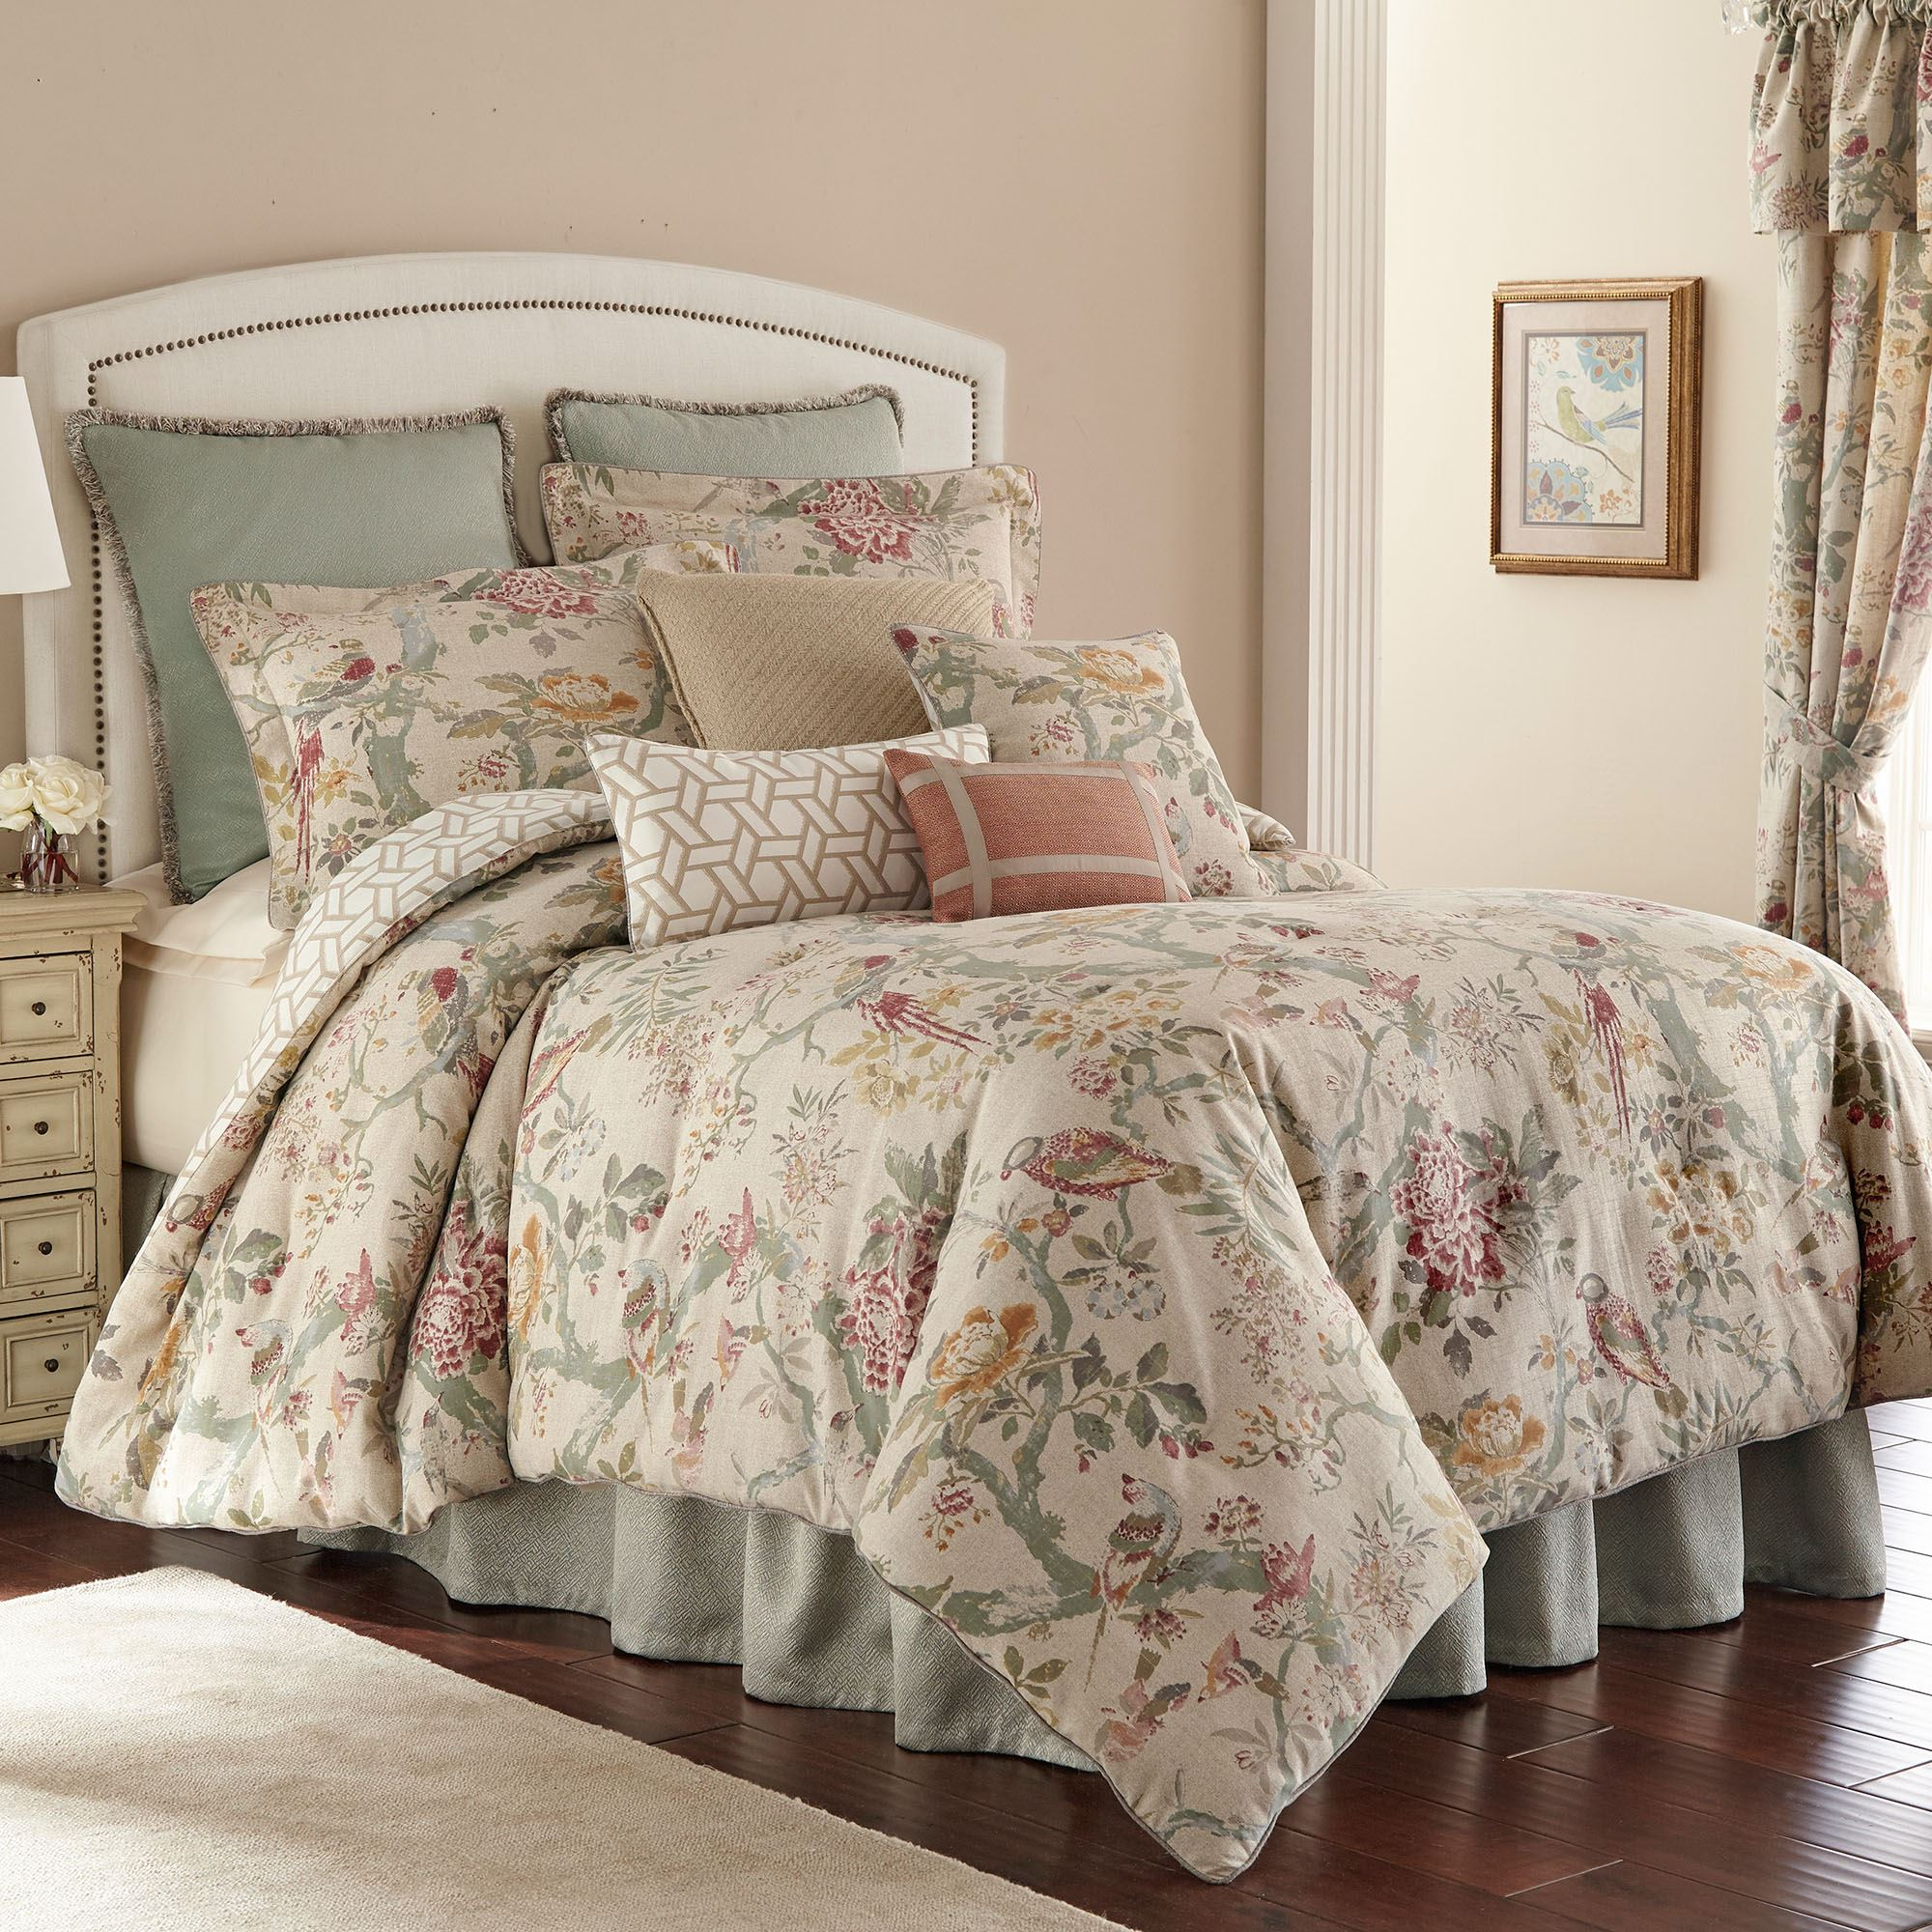 bicarri vintage style nature floral comforter bedding by rose tree